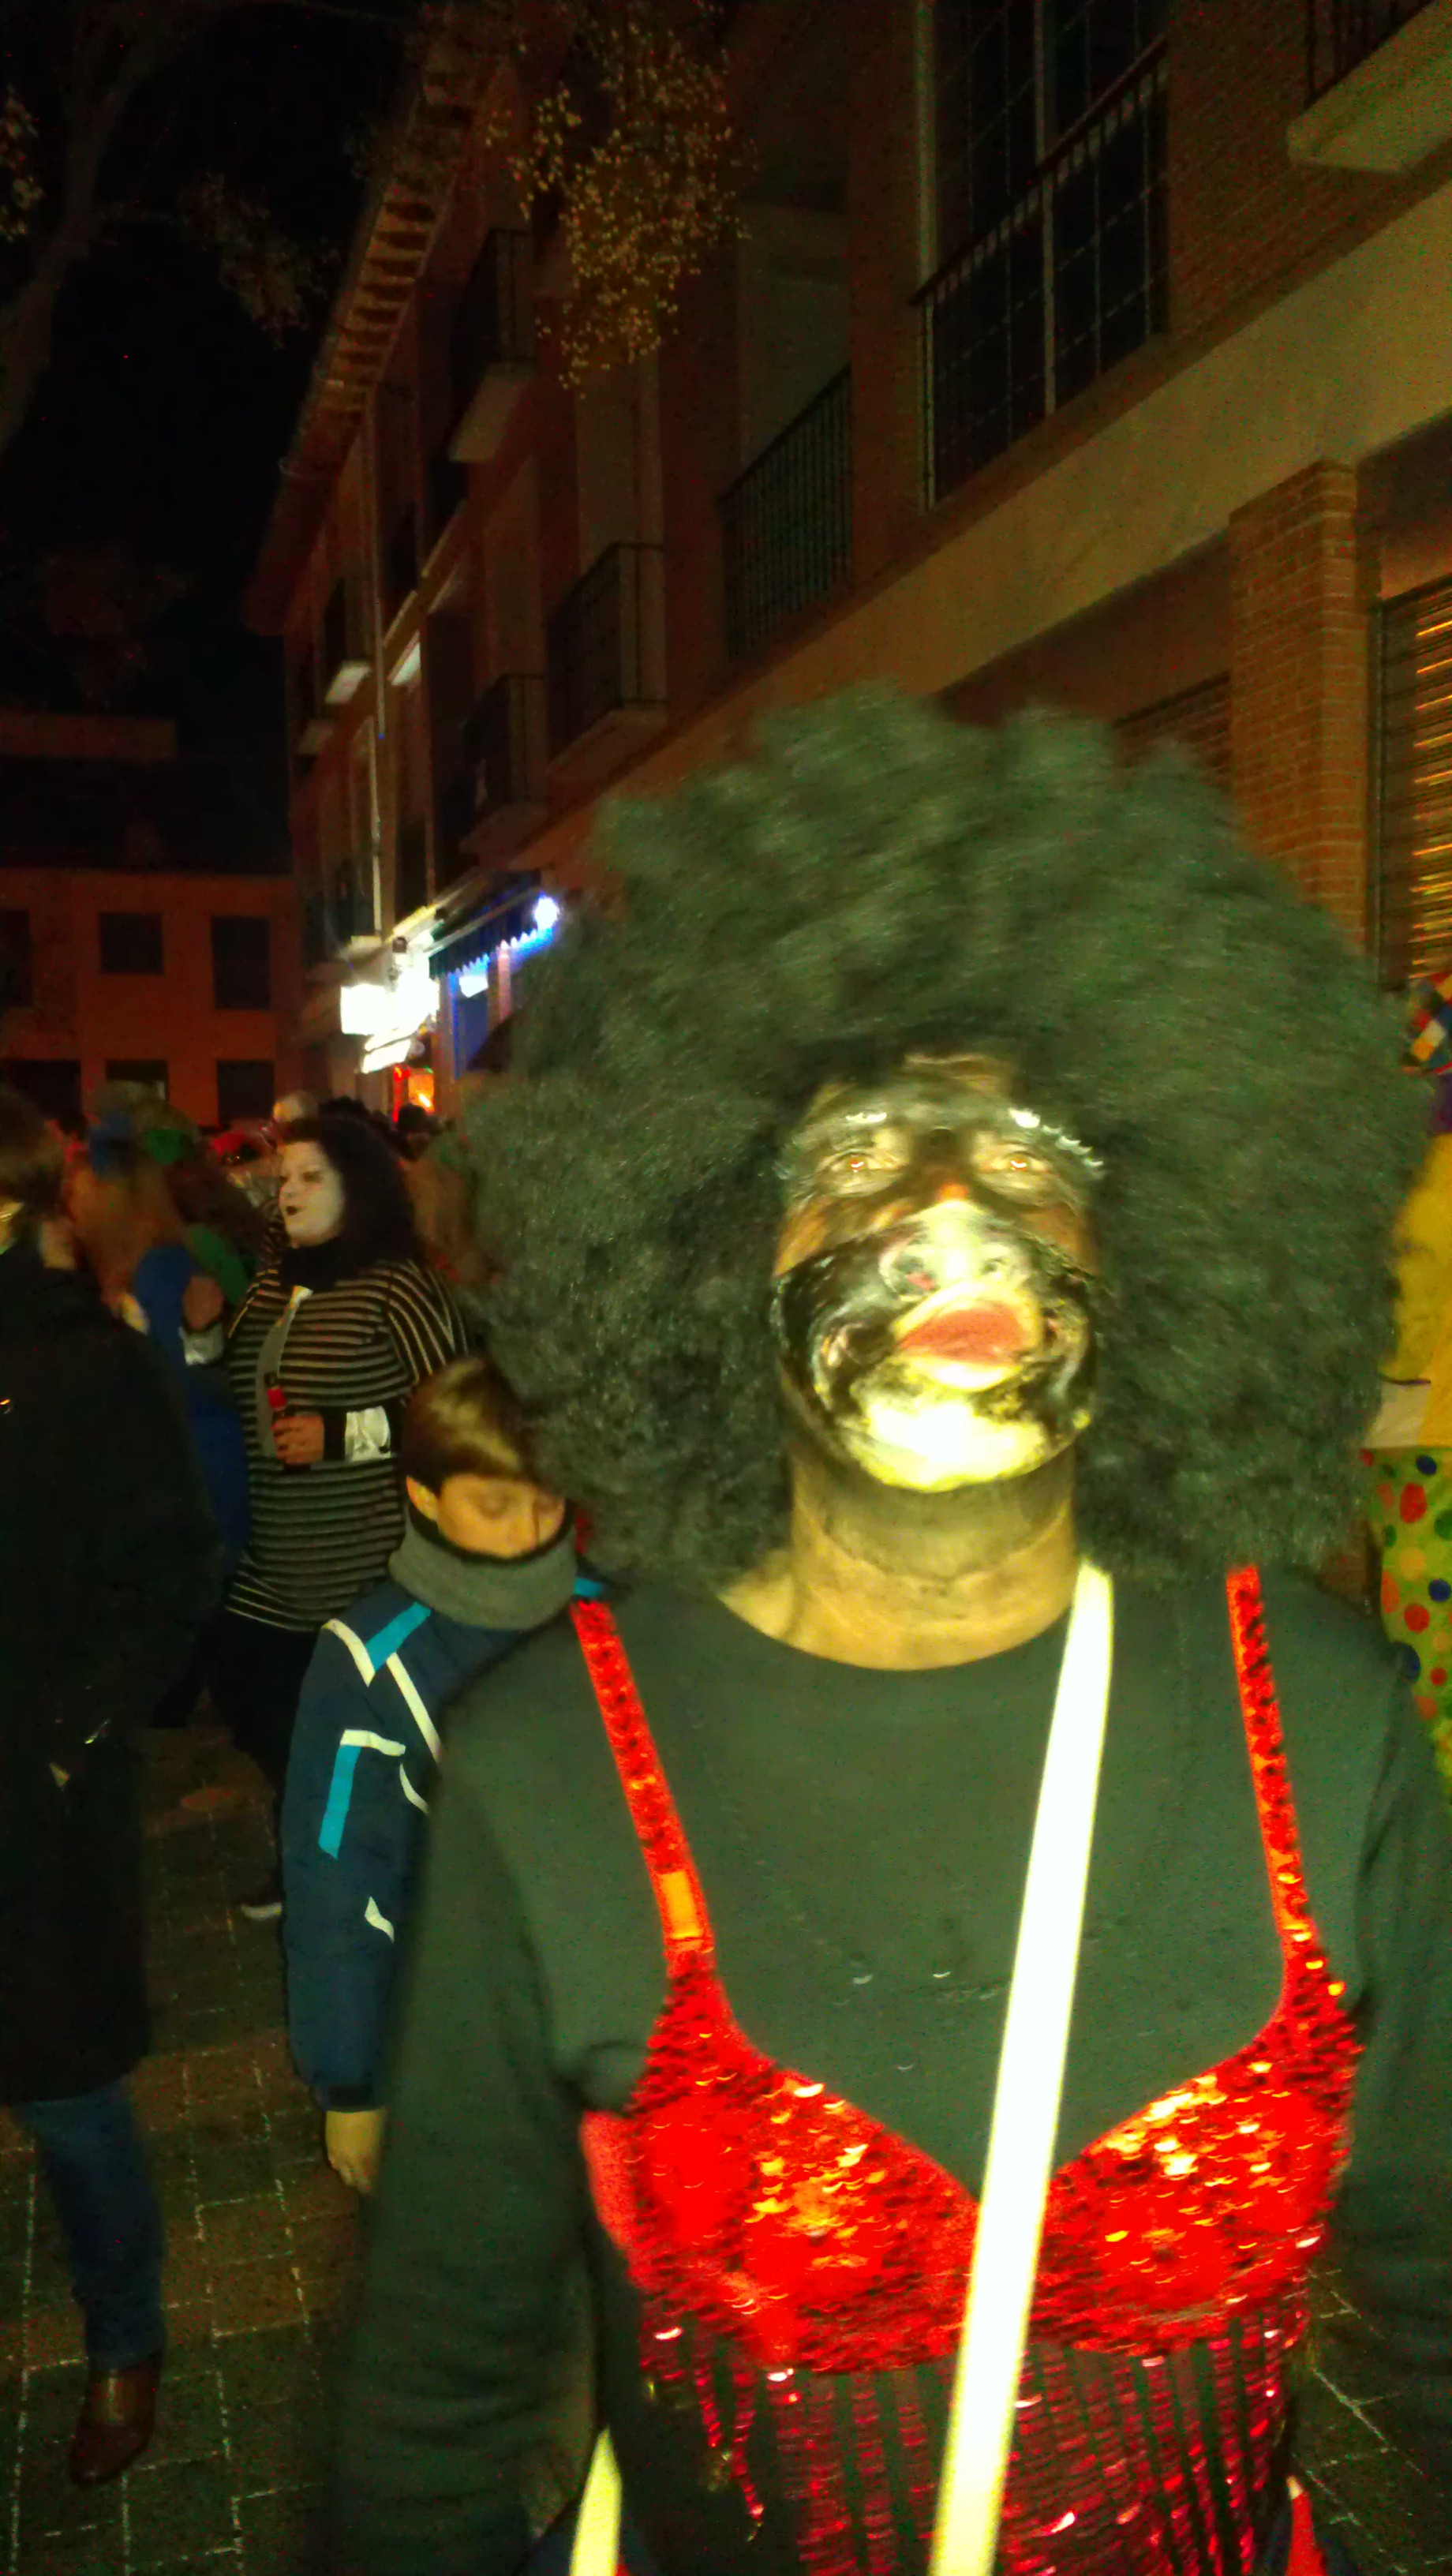 One of several 'blackfaced' Carnival goers seen in Spain